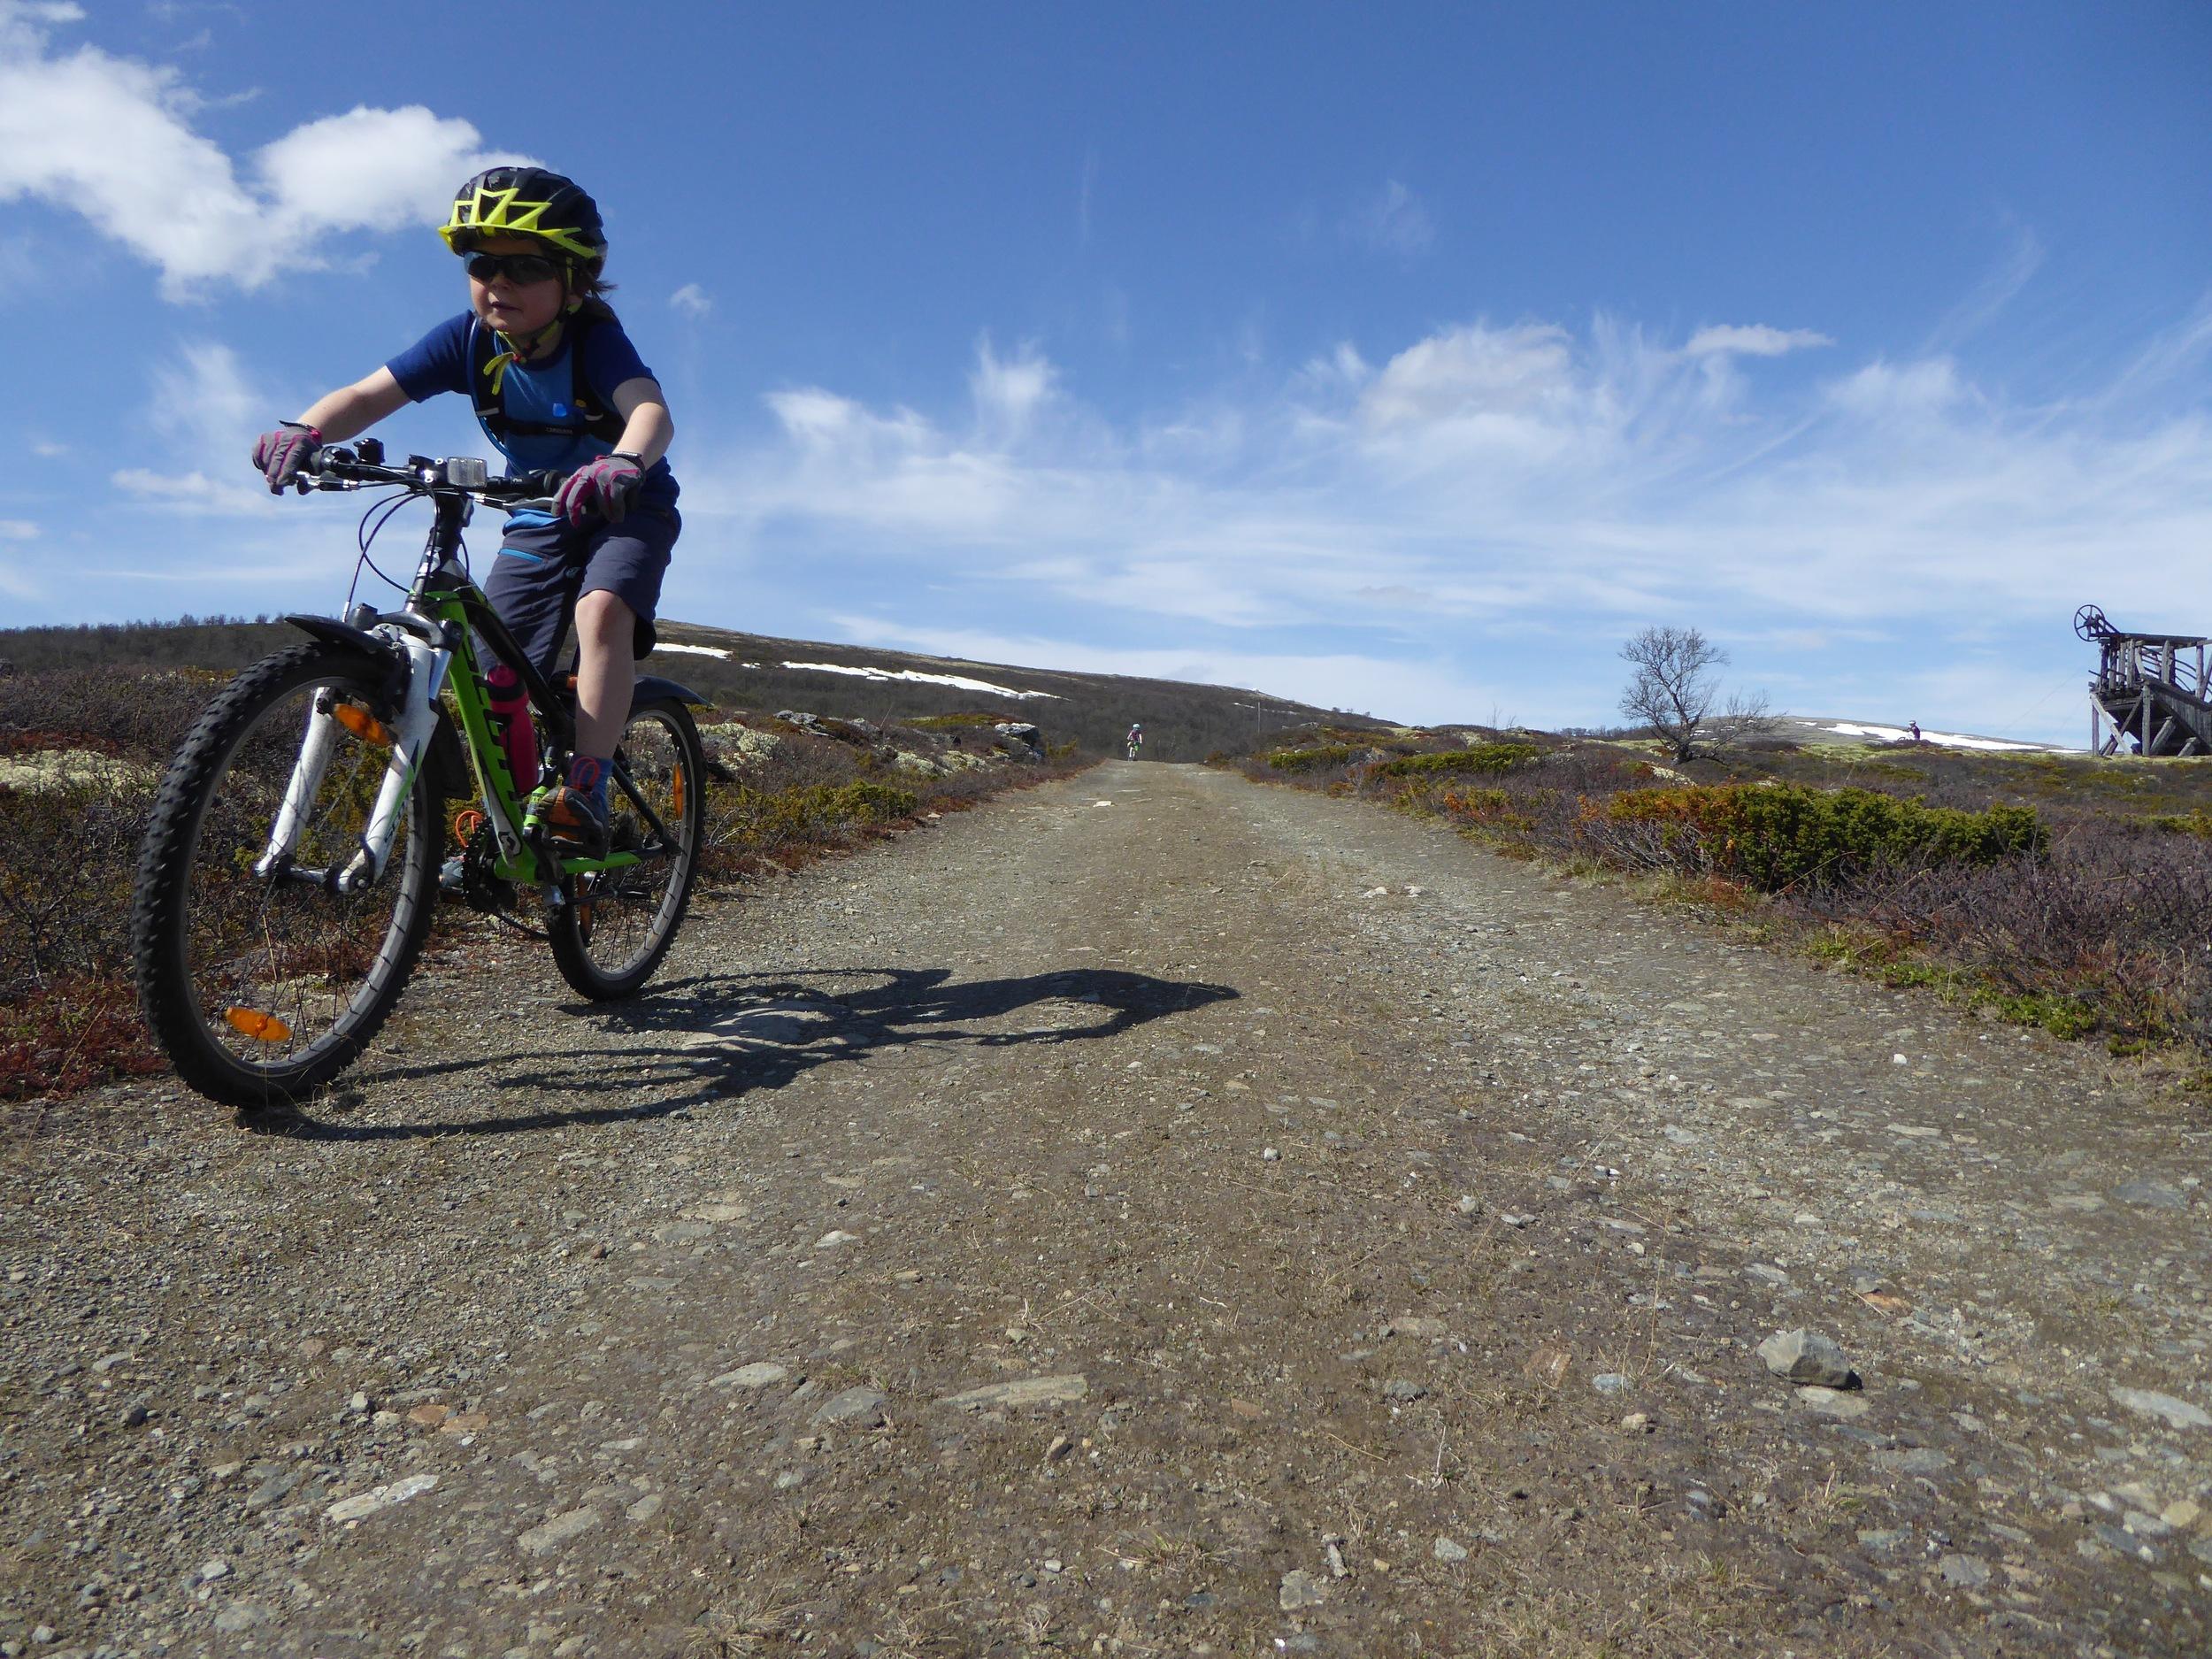 I juni kommer sommeren, og vi finner frem shorts og sykler på tur i Grimsdalen